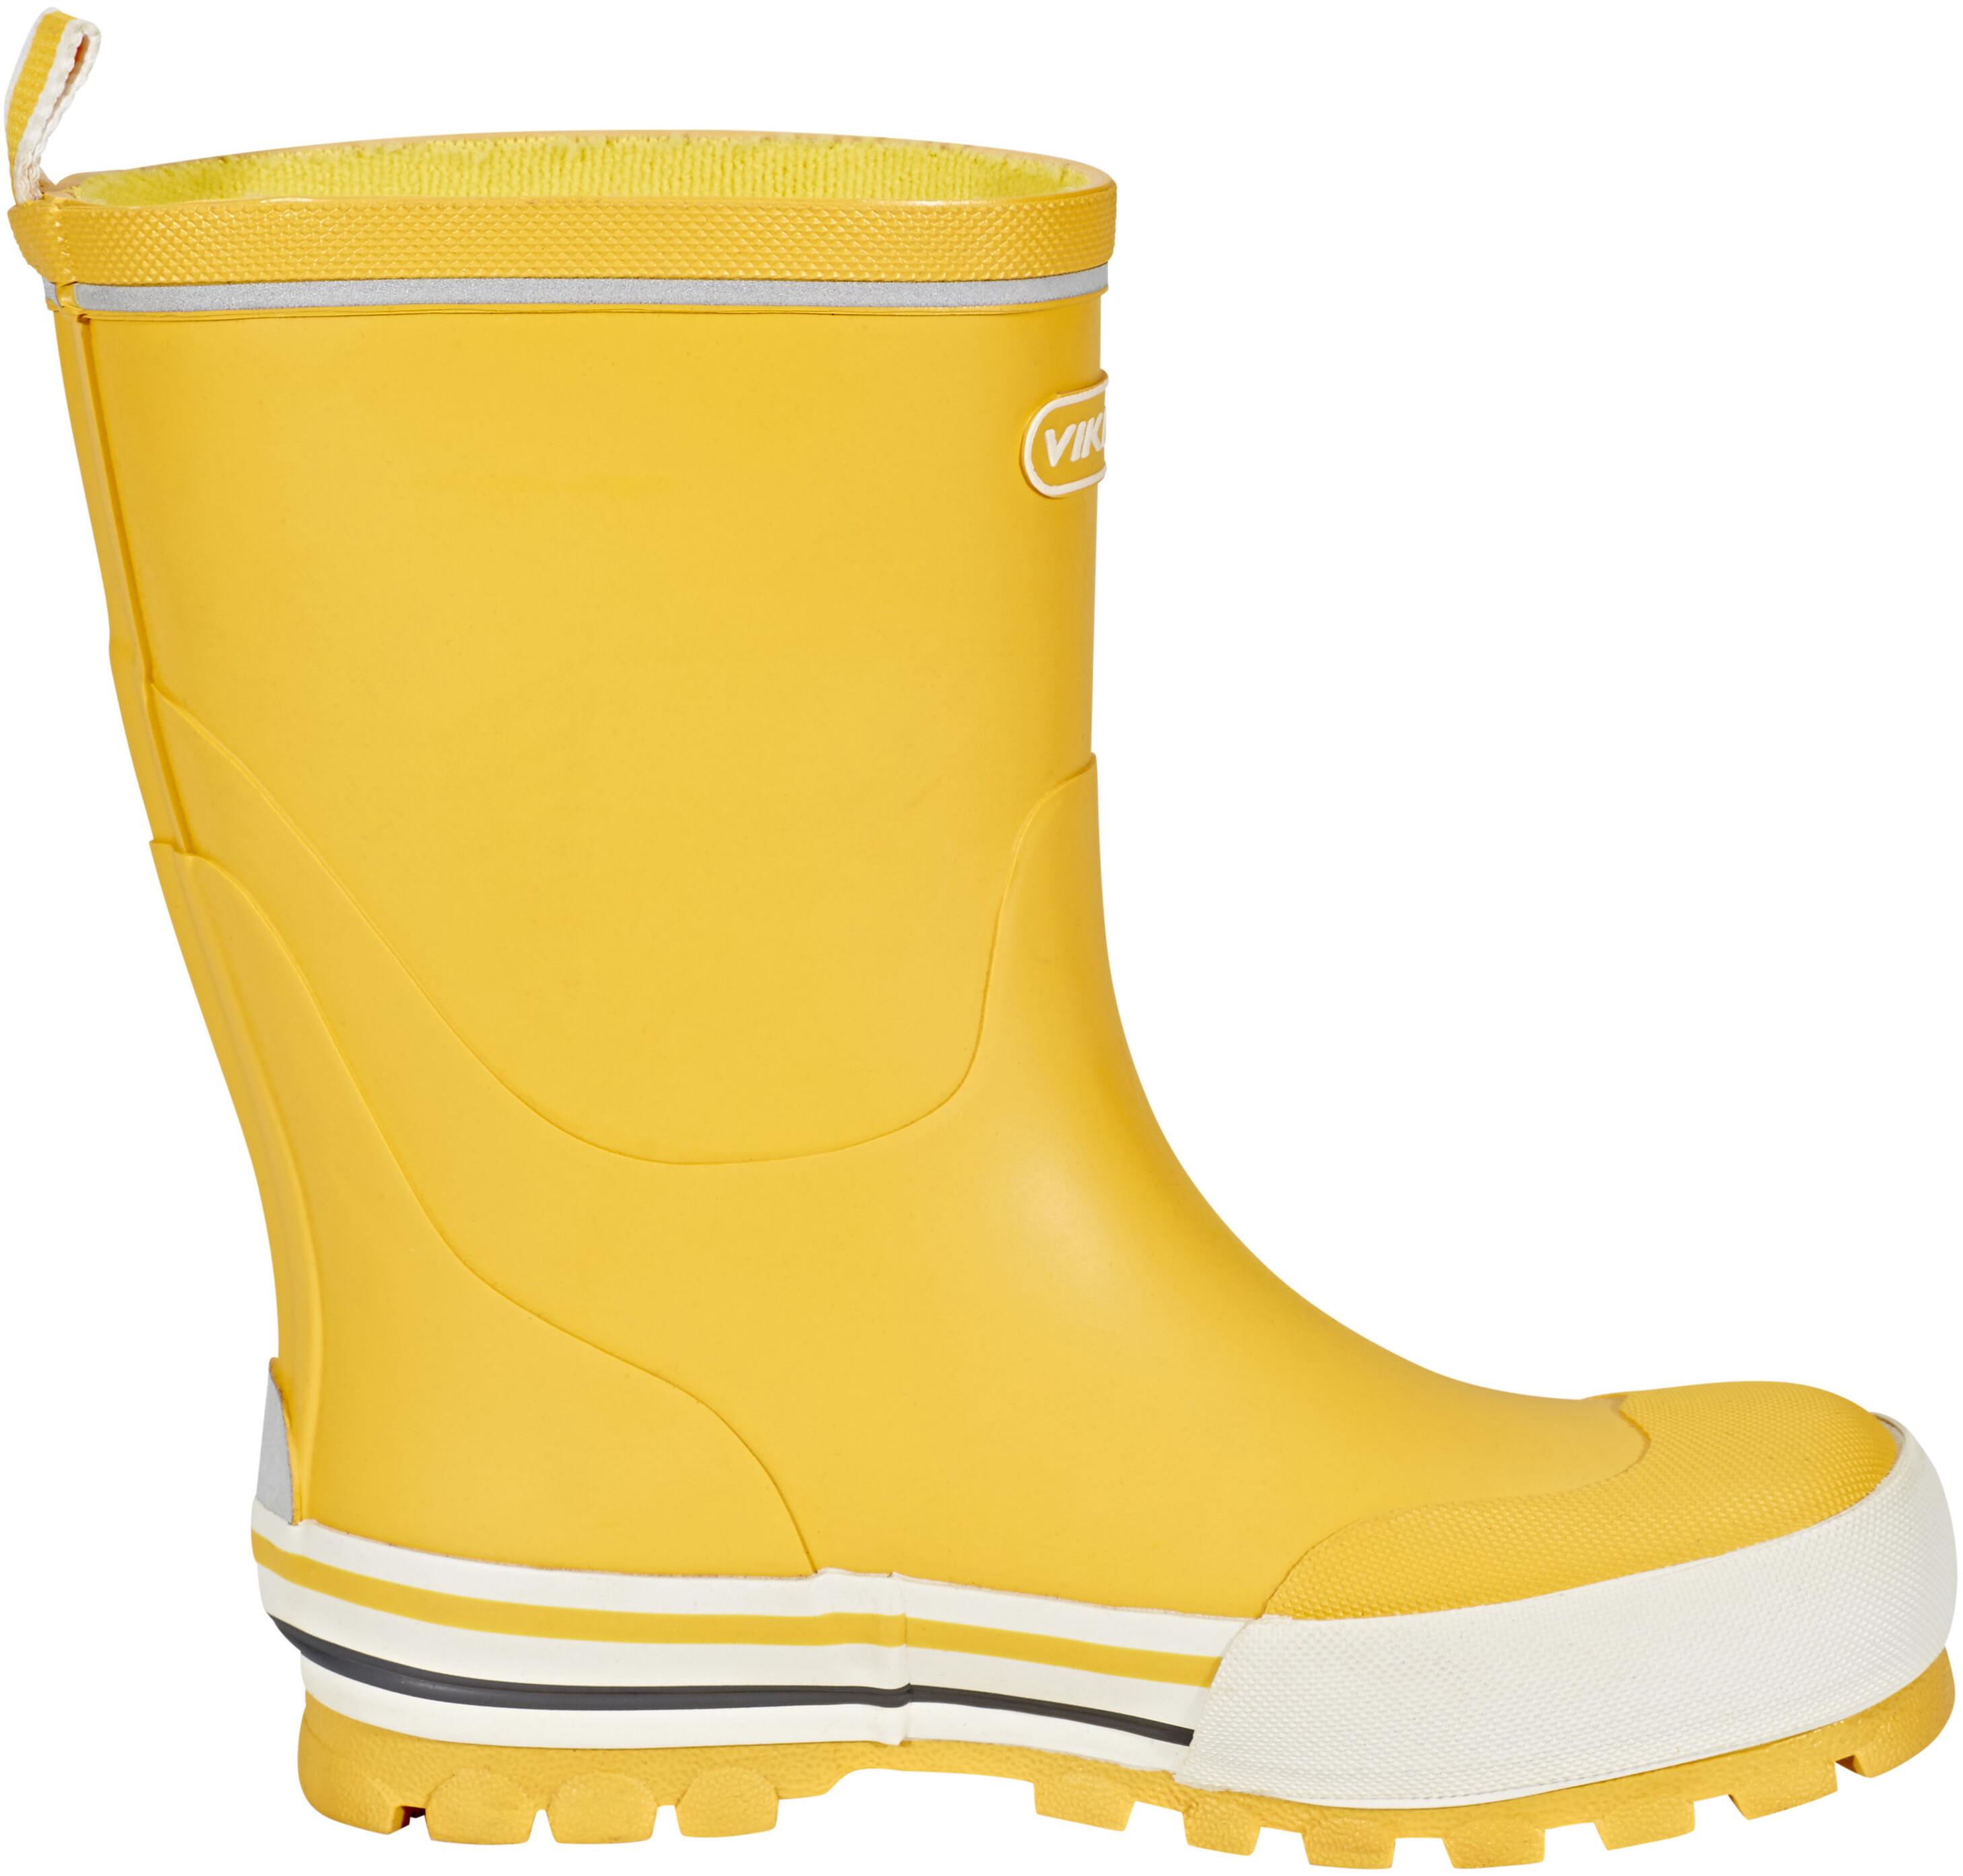 viking footwear jolly bottes en caoutchouc enfant jaune sur. Black Bedroom Furniture Sets. Home Design Ideas